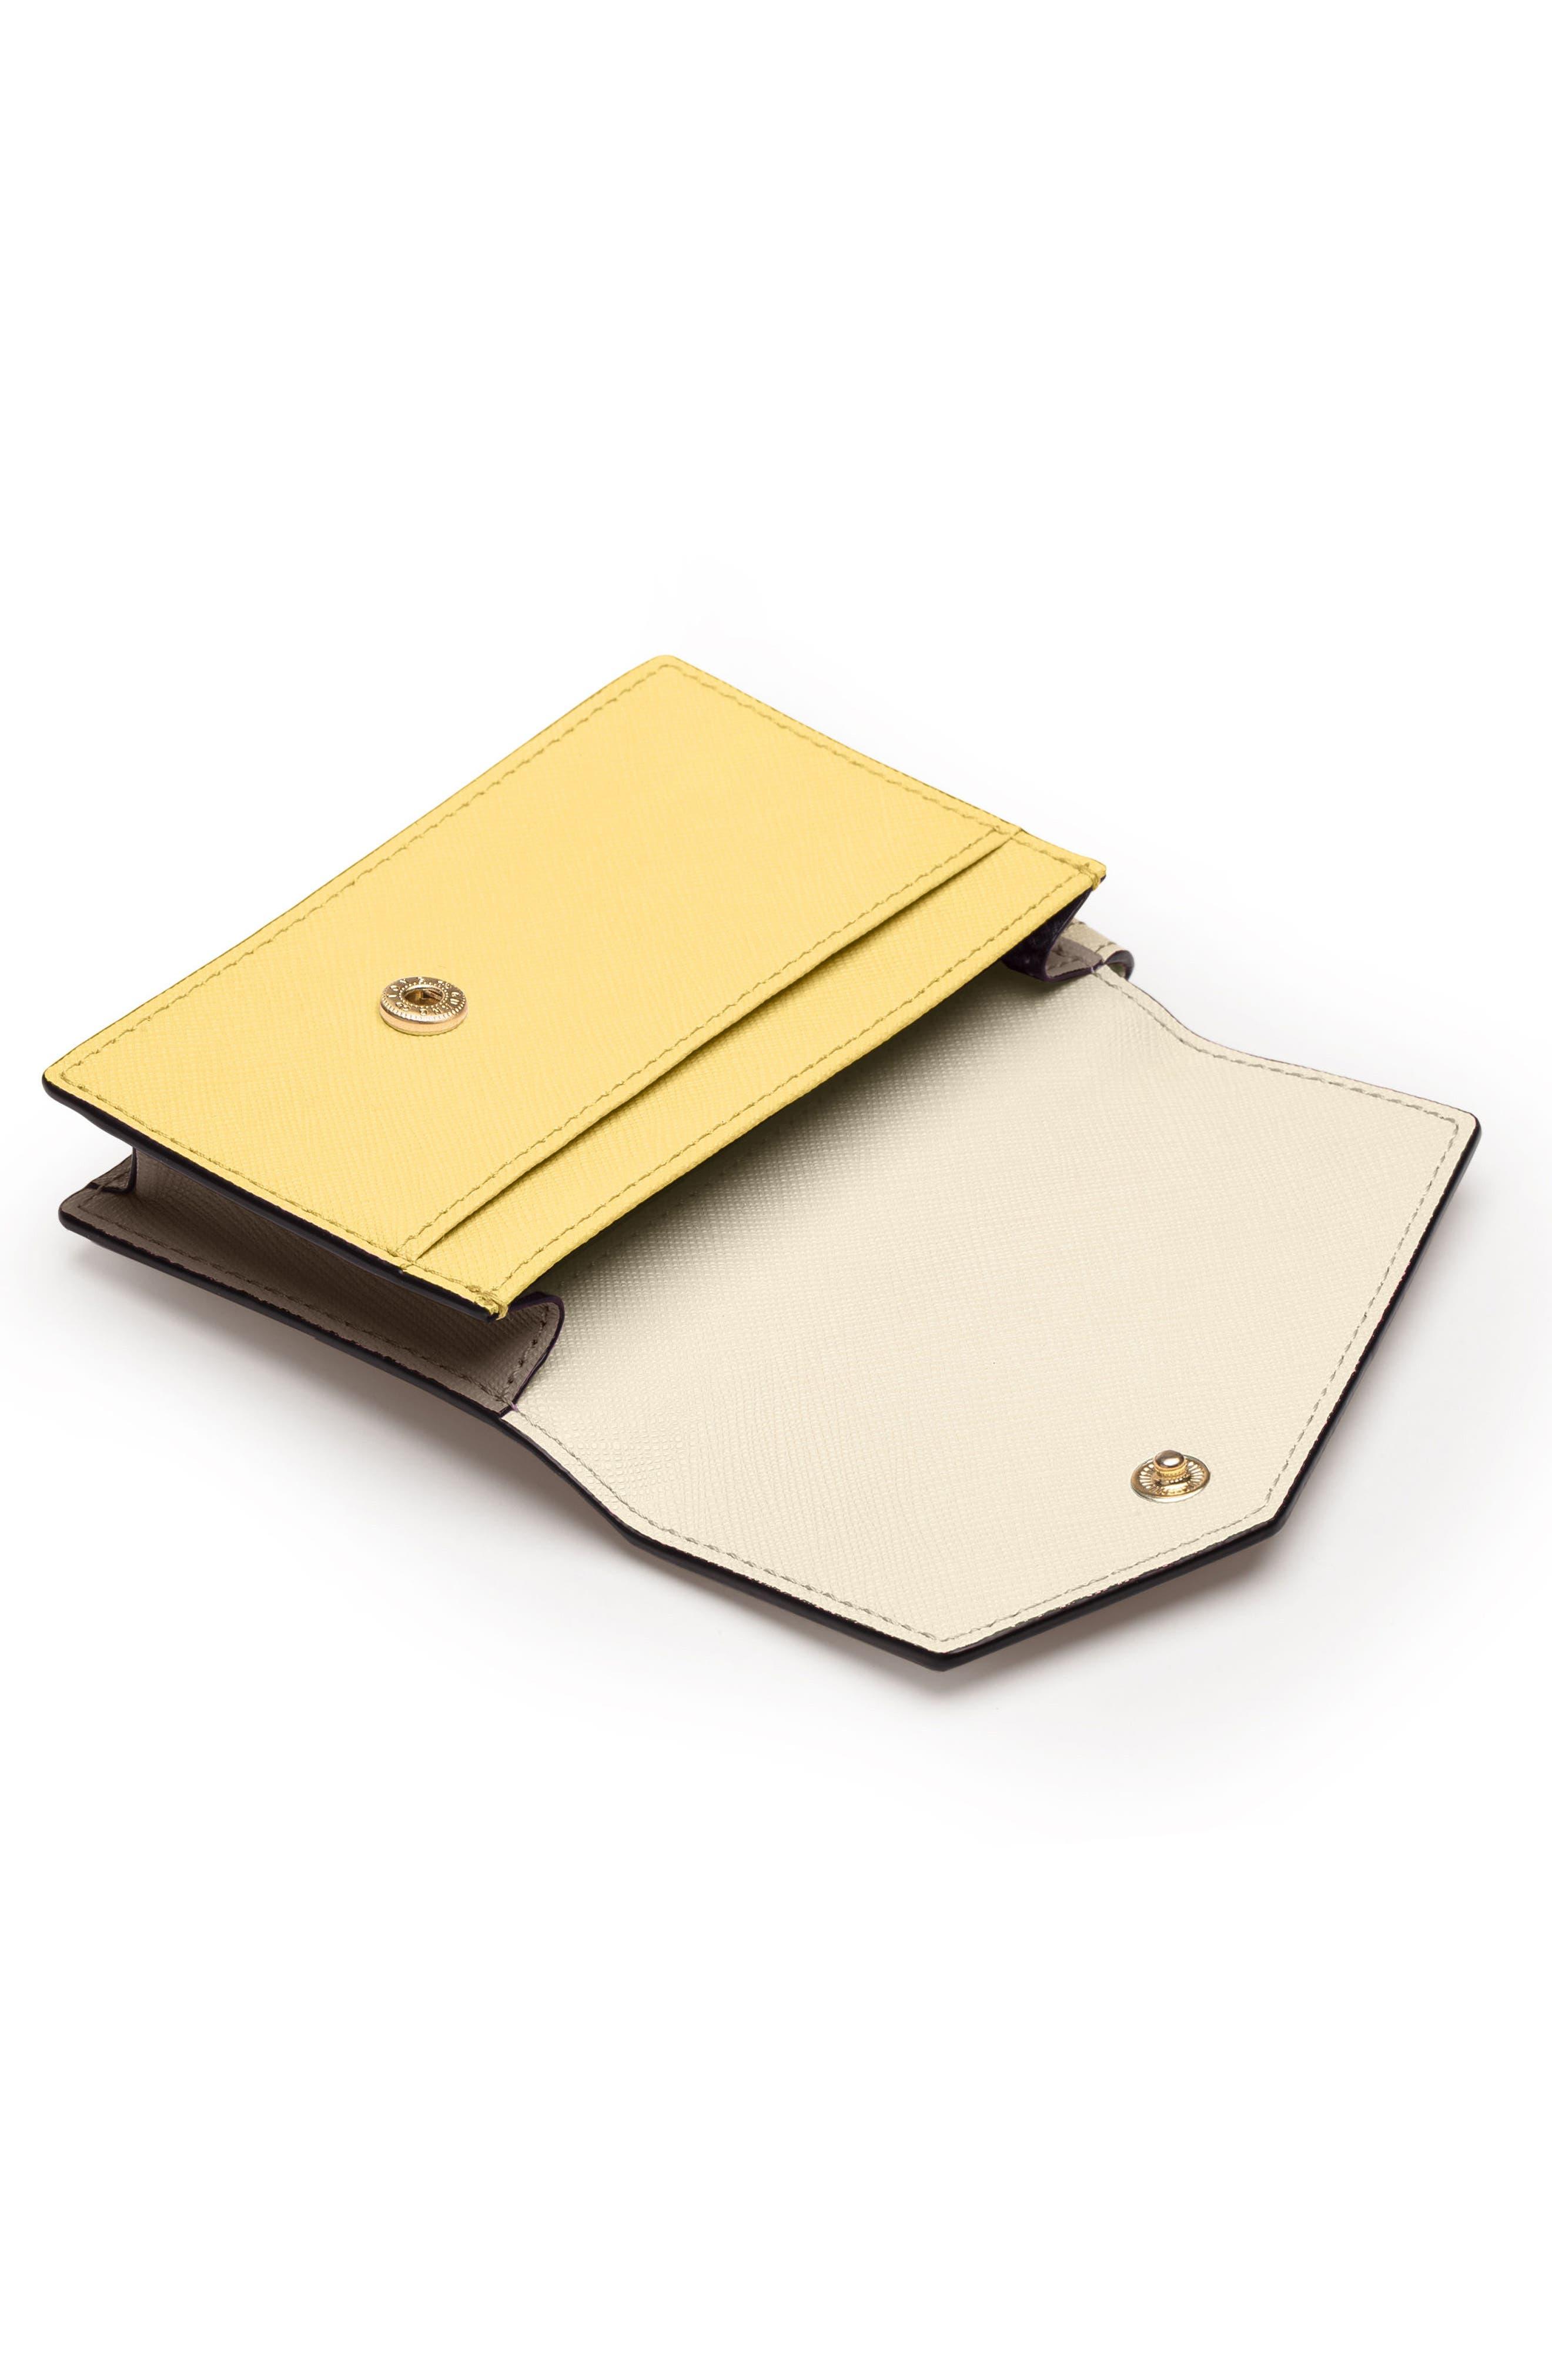 Cobble Hill Saffiano Leather Card Case,                             Alternate thumbnail 2, color,                             CREAM COLORBLOCK